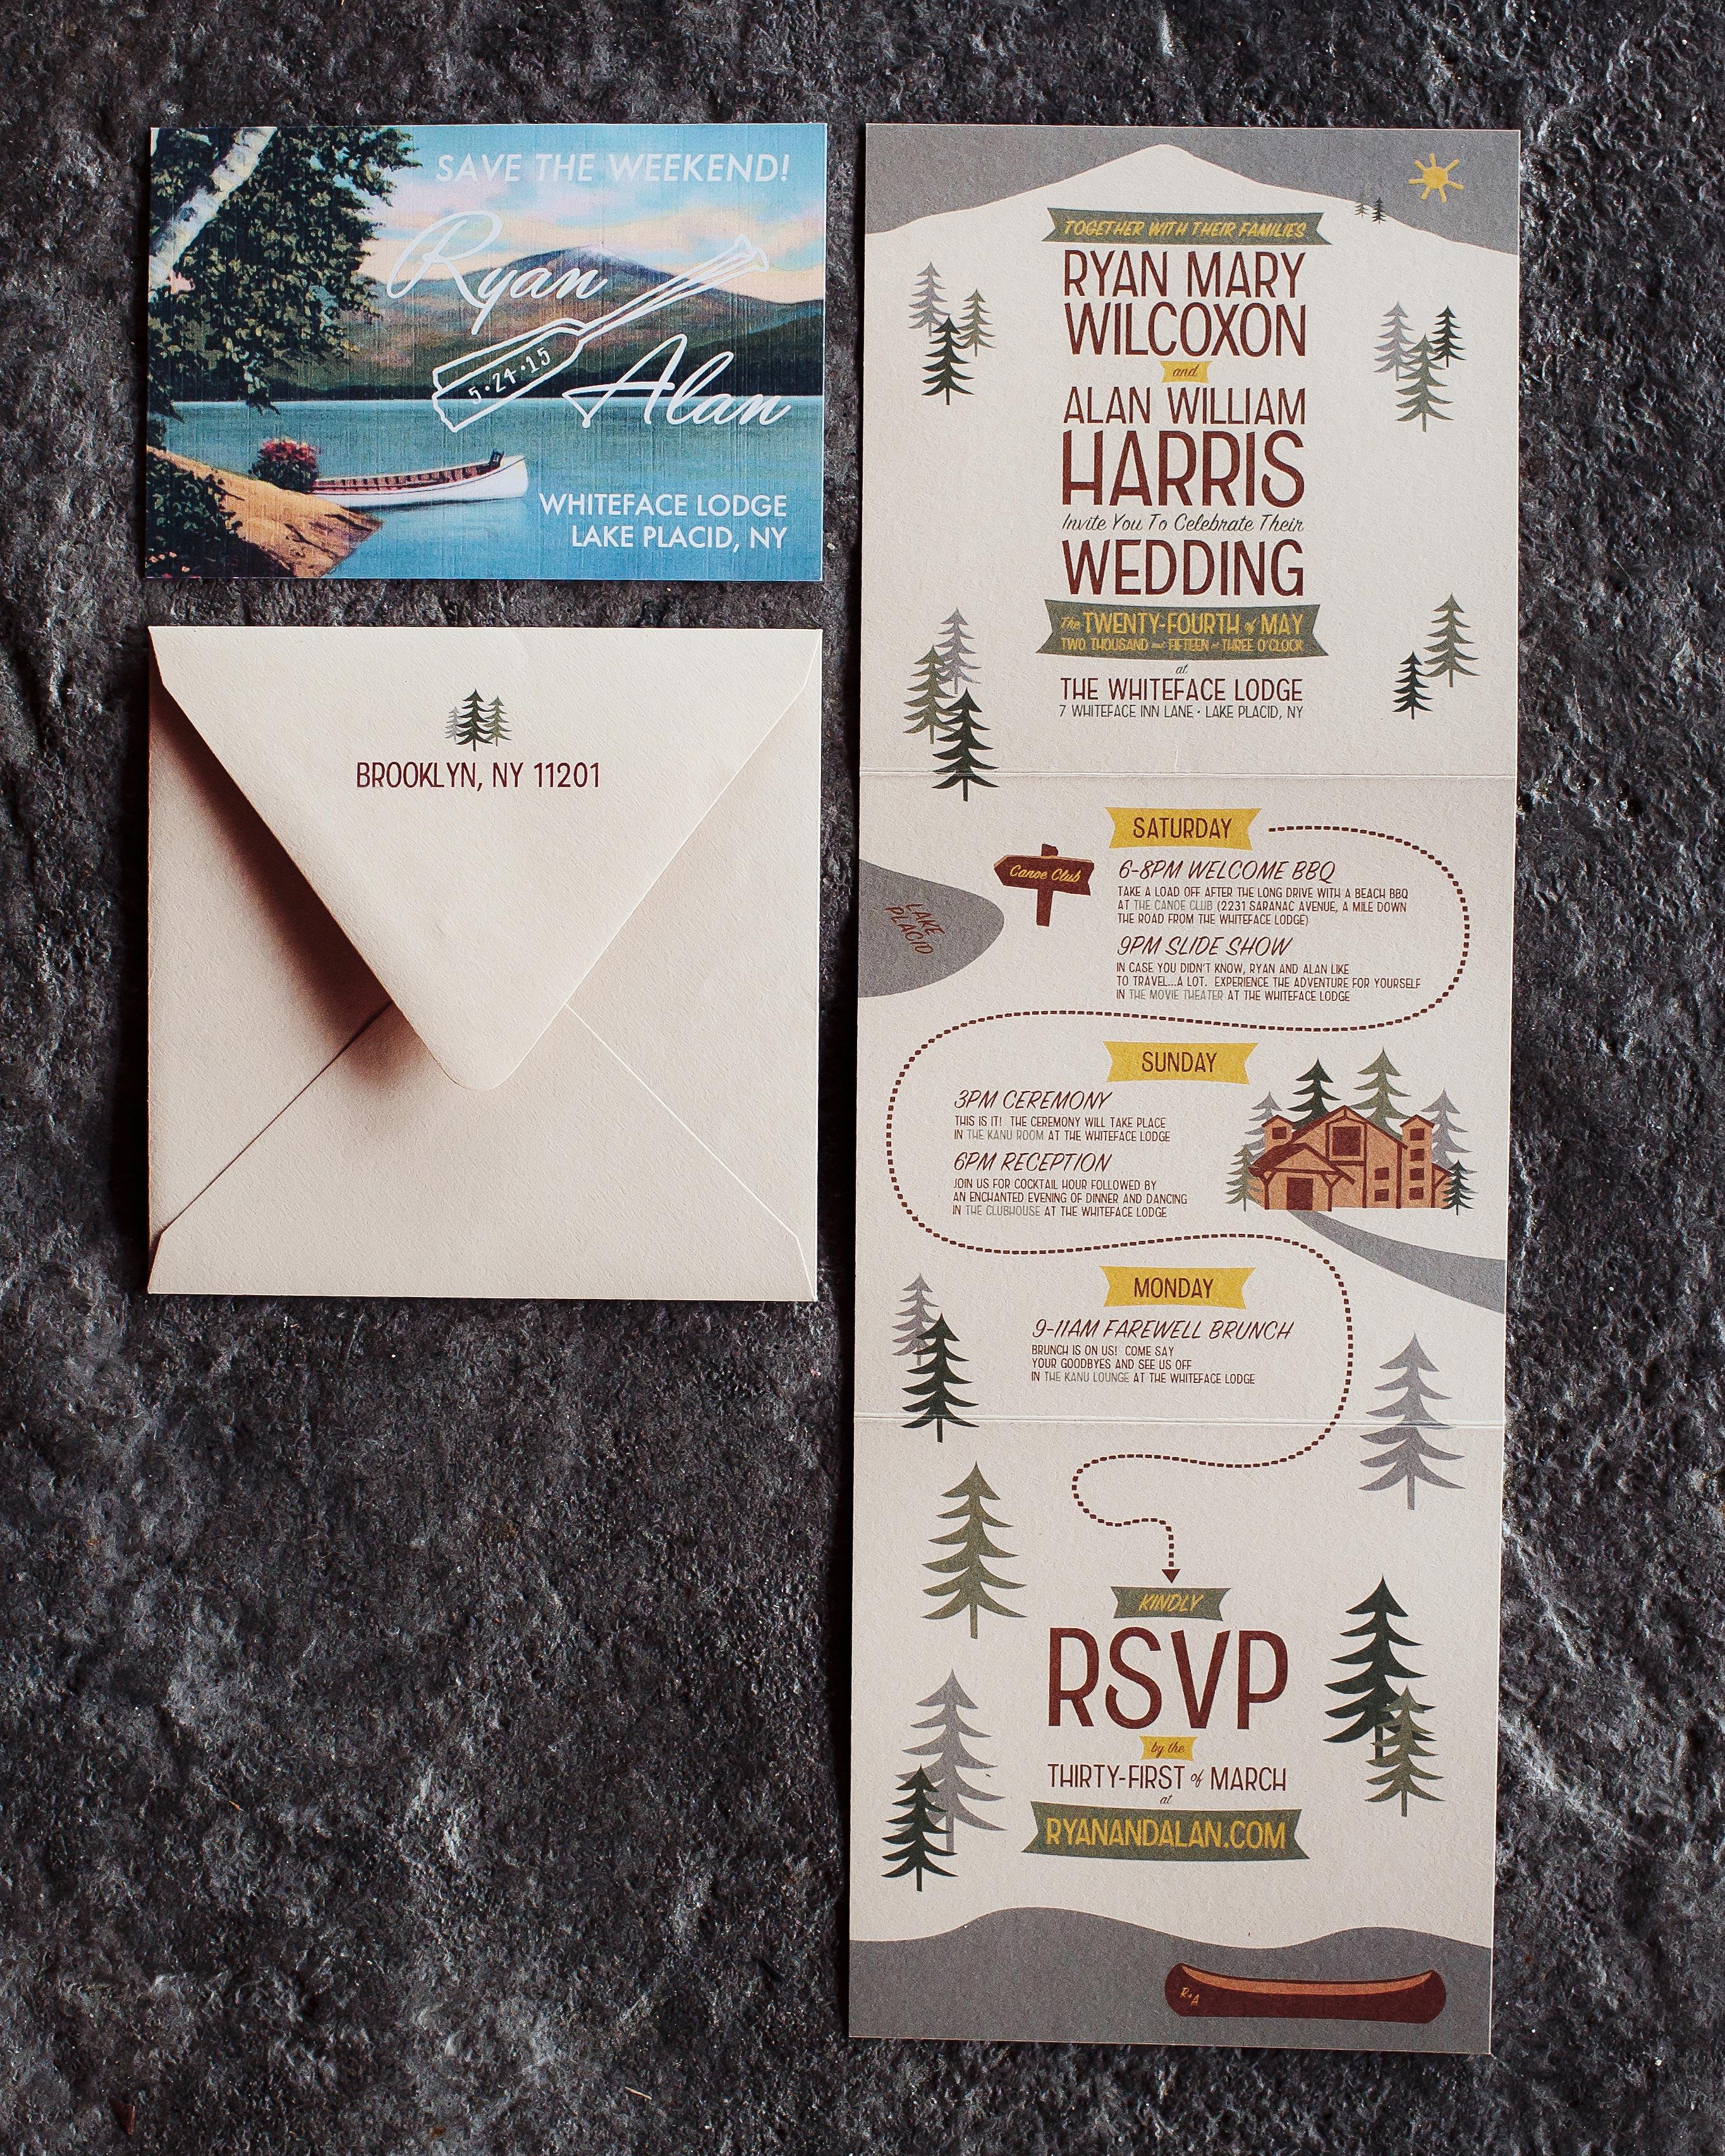 ryan-alan-wedding-stationery-26-0083-s112966-0516.jpg